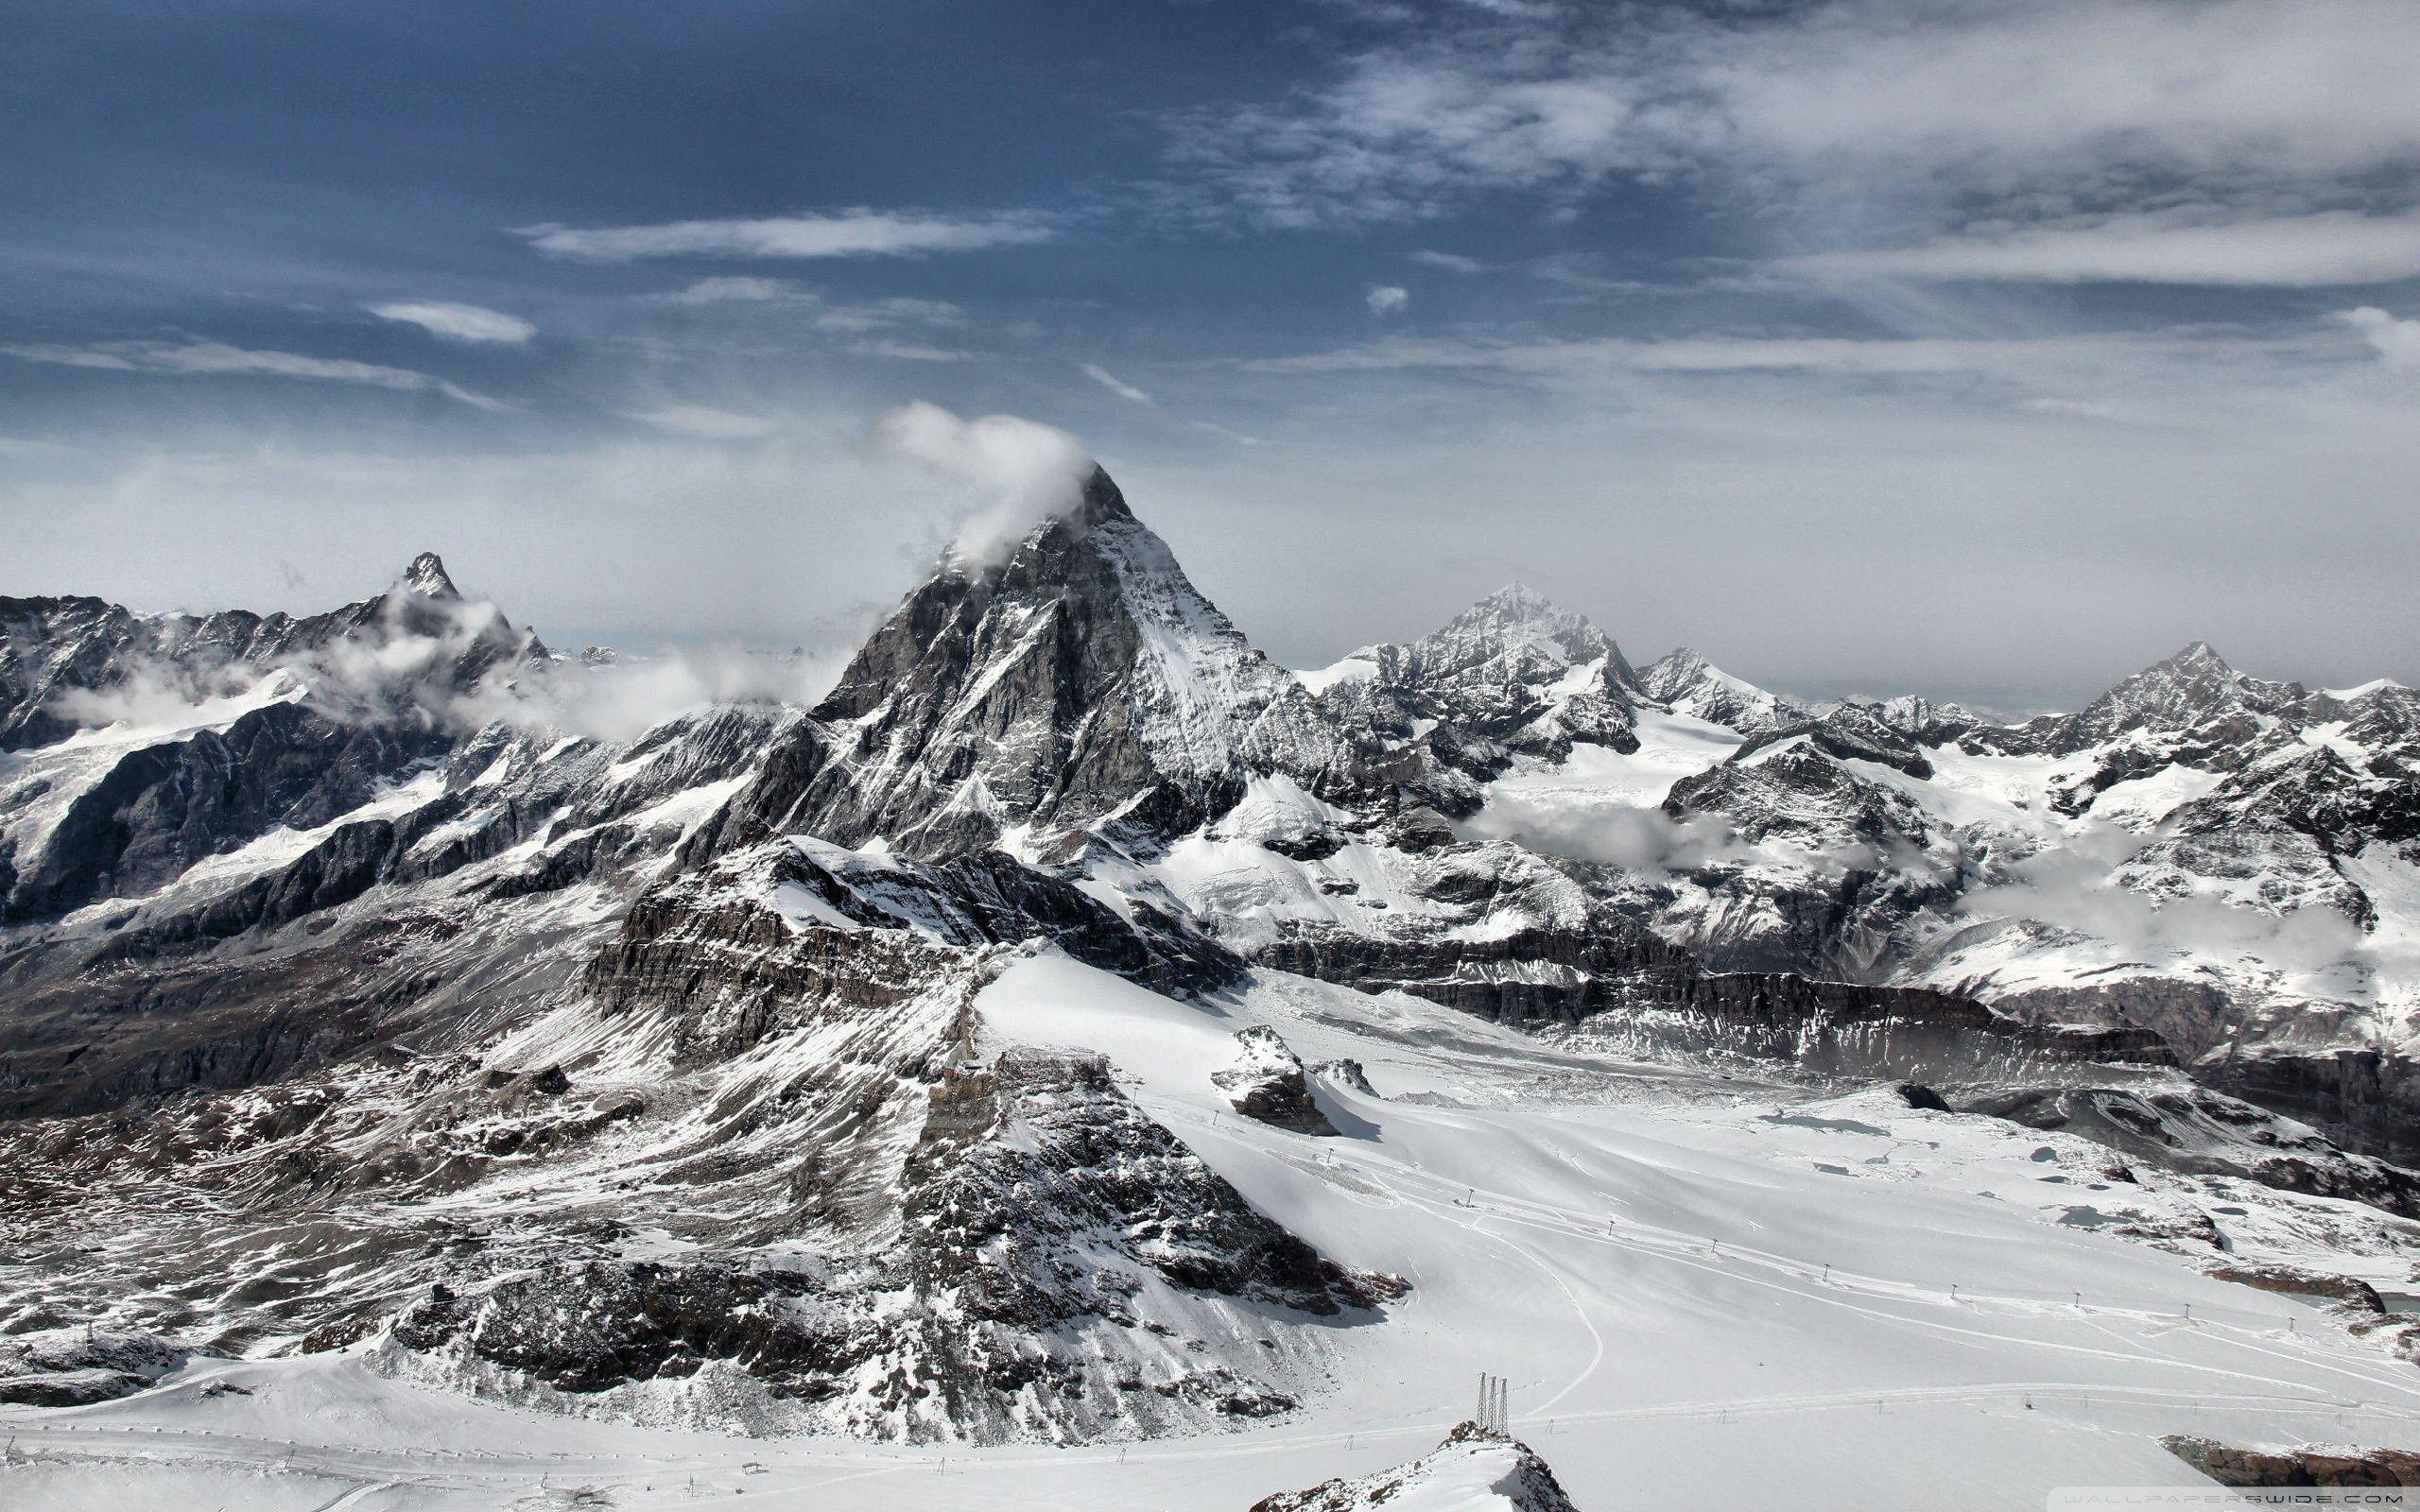 Snowy Mountains Hd Desktop Wallpaper High Definition